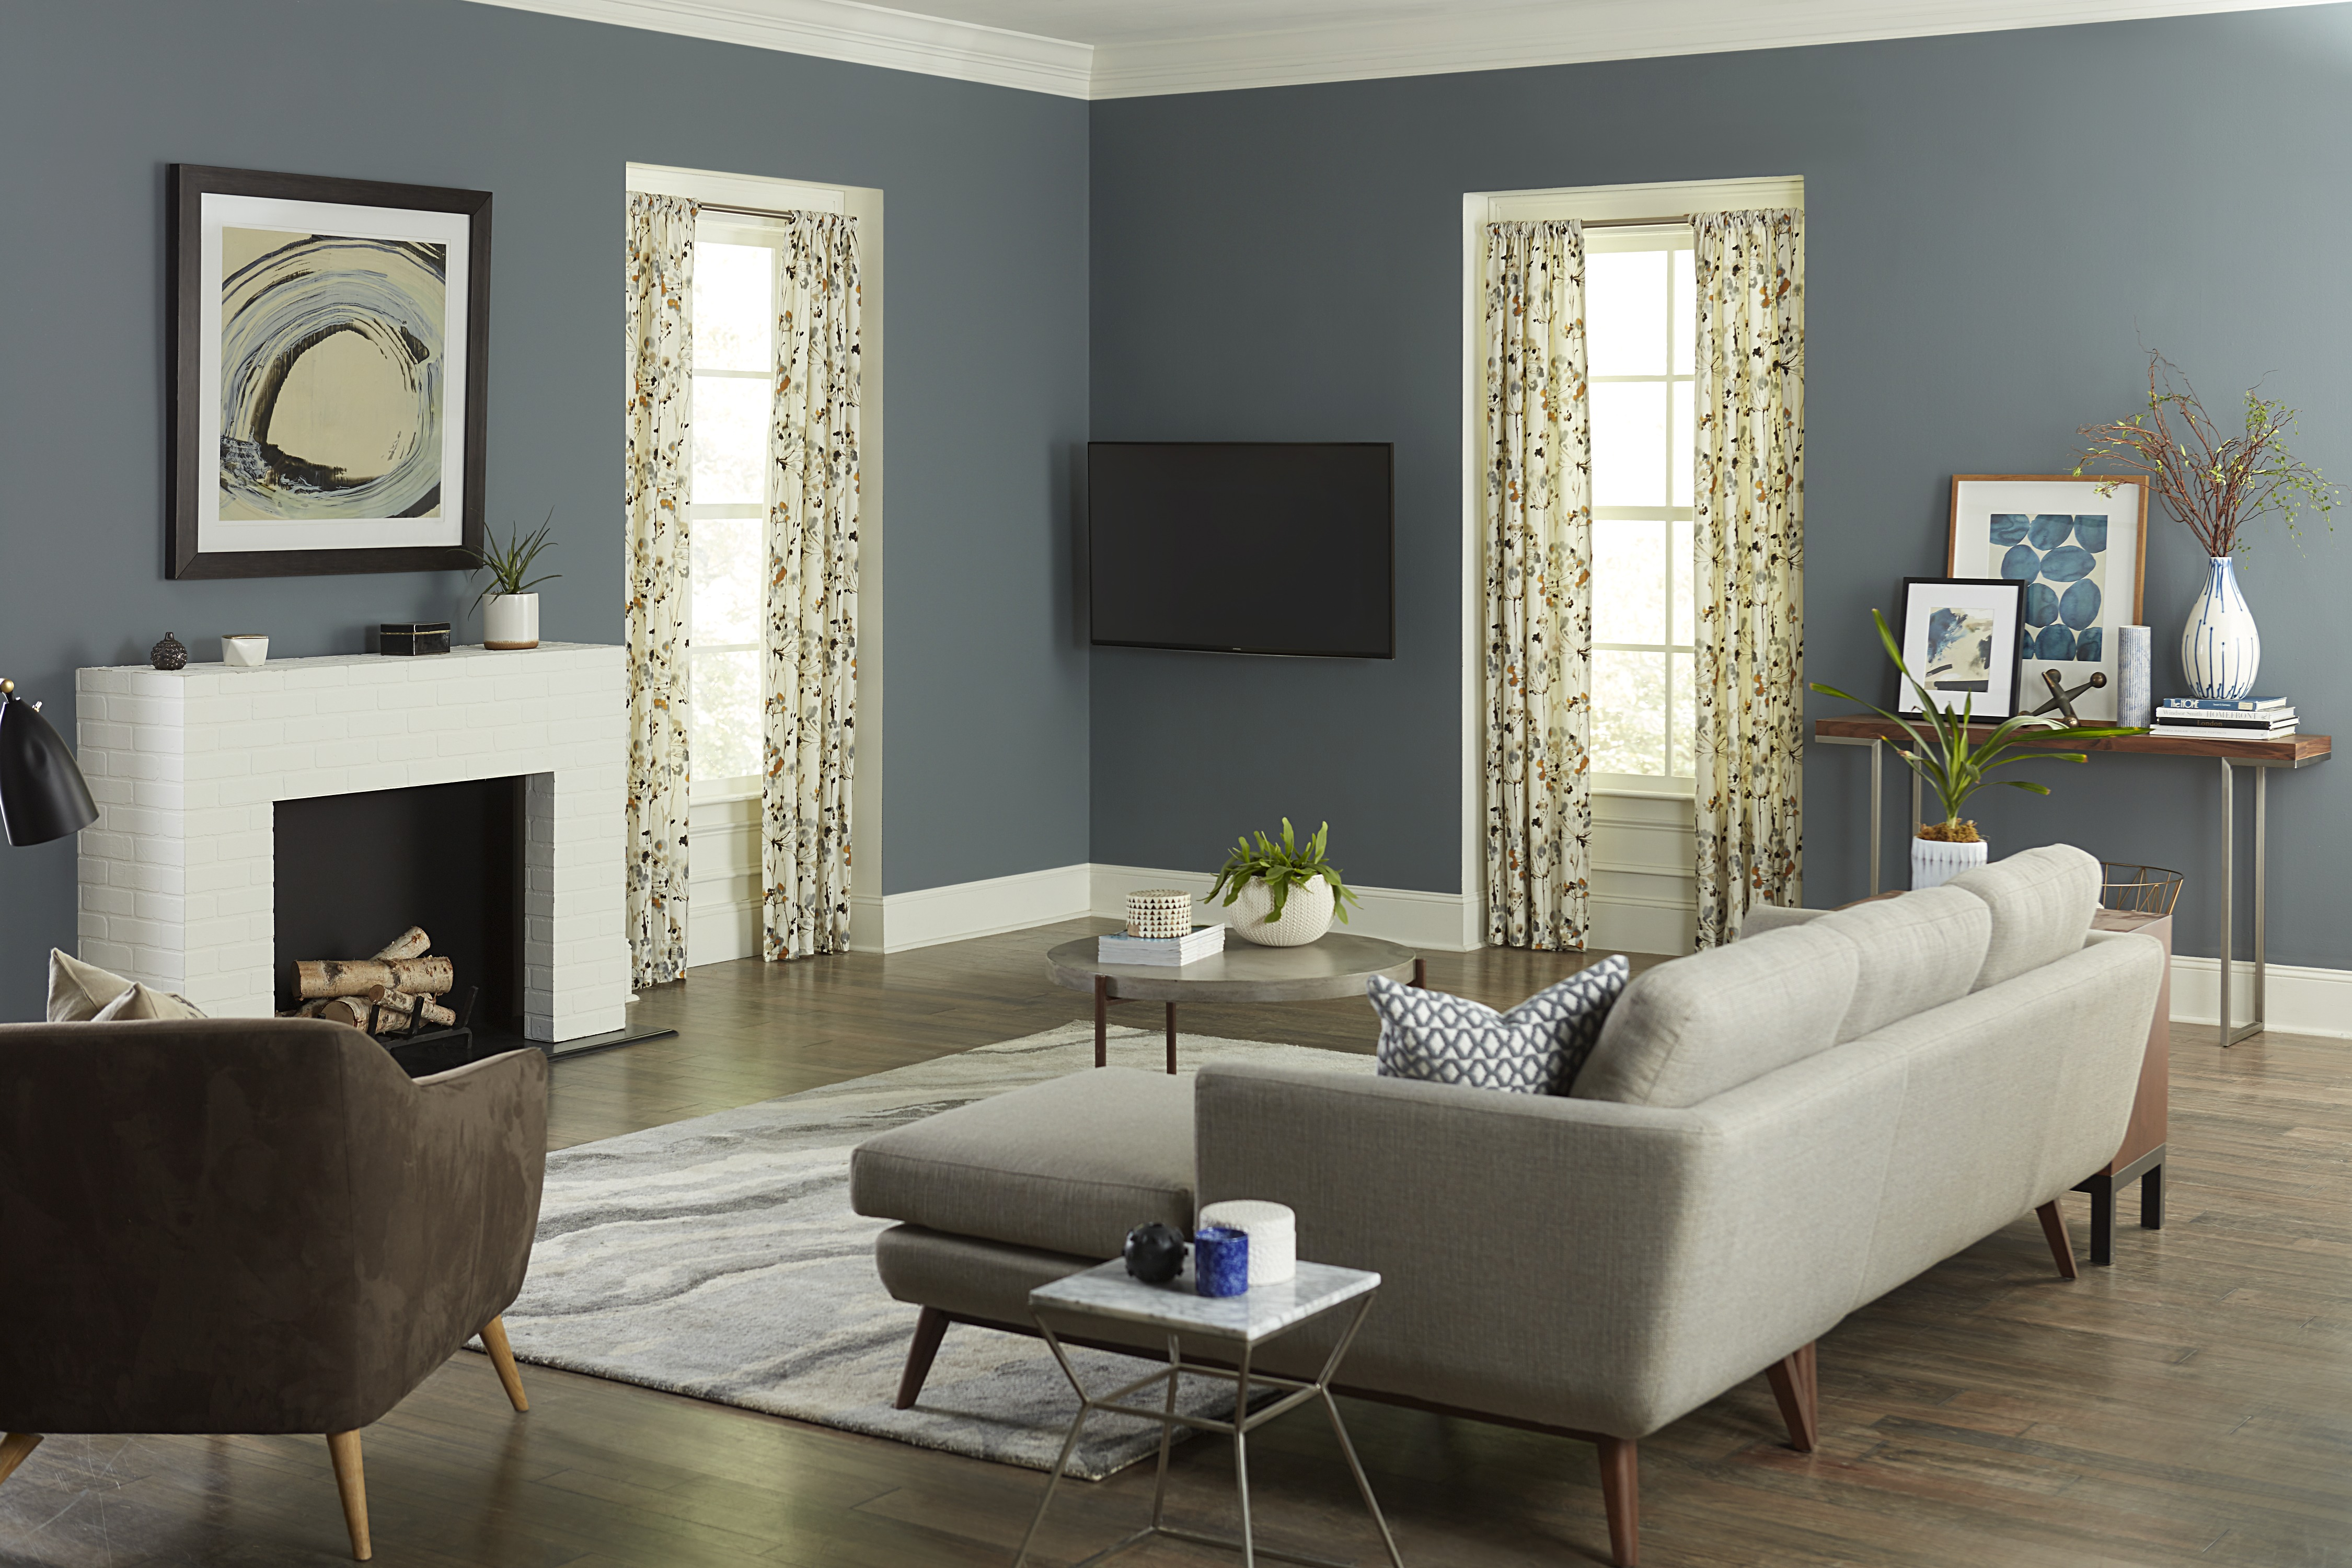 TV mounted in corner recessed